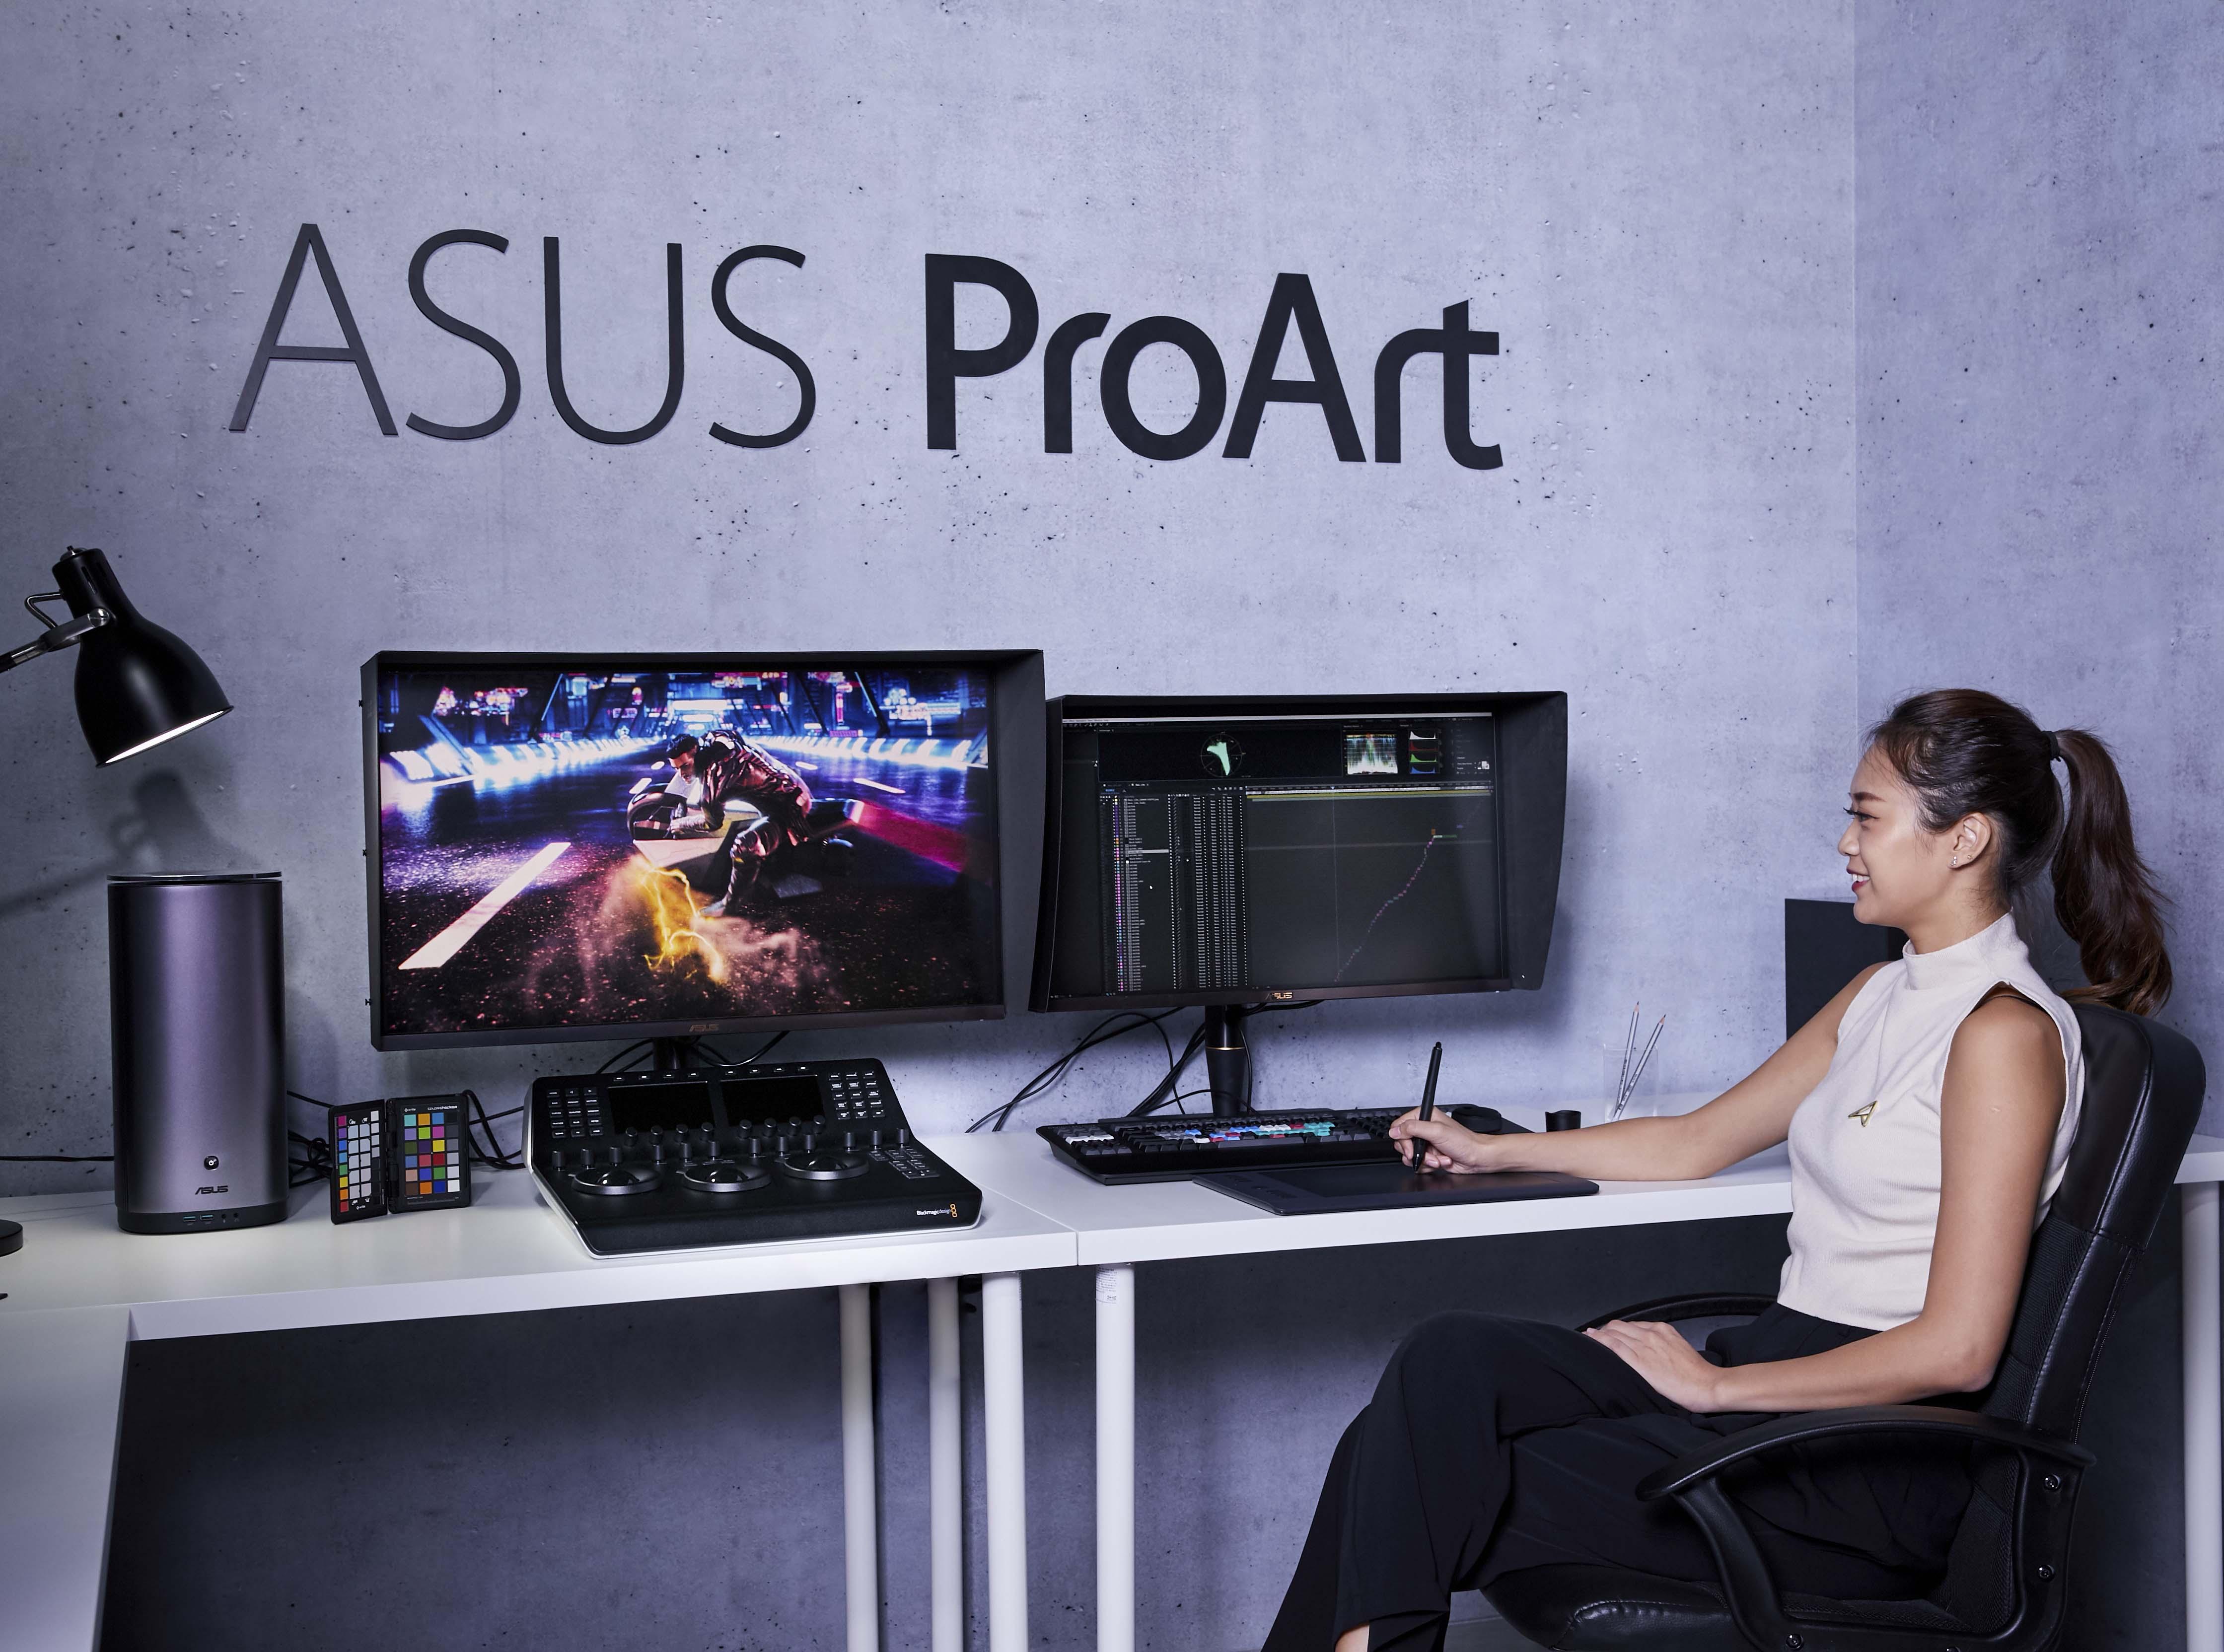 ProArt PA90ProArt PQ22UC可攜式專業螢幕,搭配全球首款採用mini-LED背光的32吋4K HDR螢幕的ProArt PA32UCX,從此輕鬆應對各種工作中所面臨的專業所需。